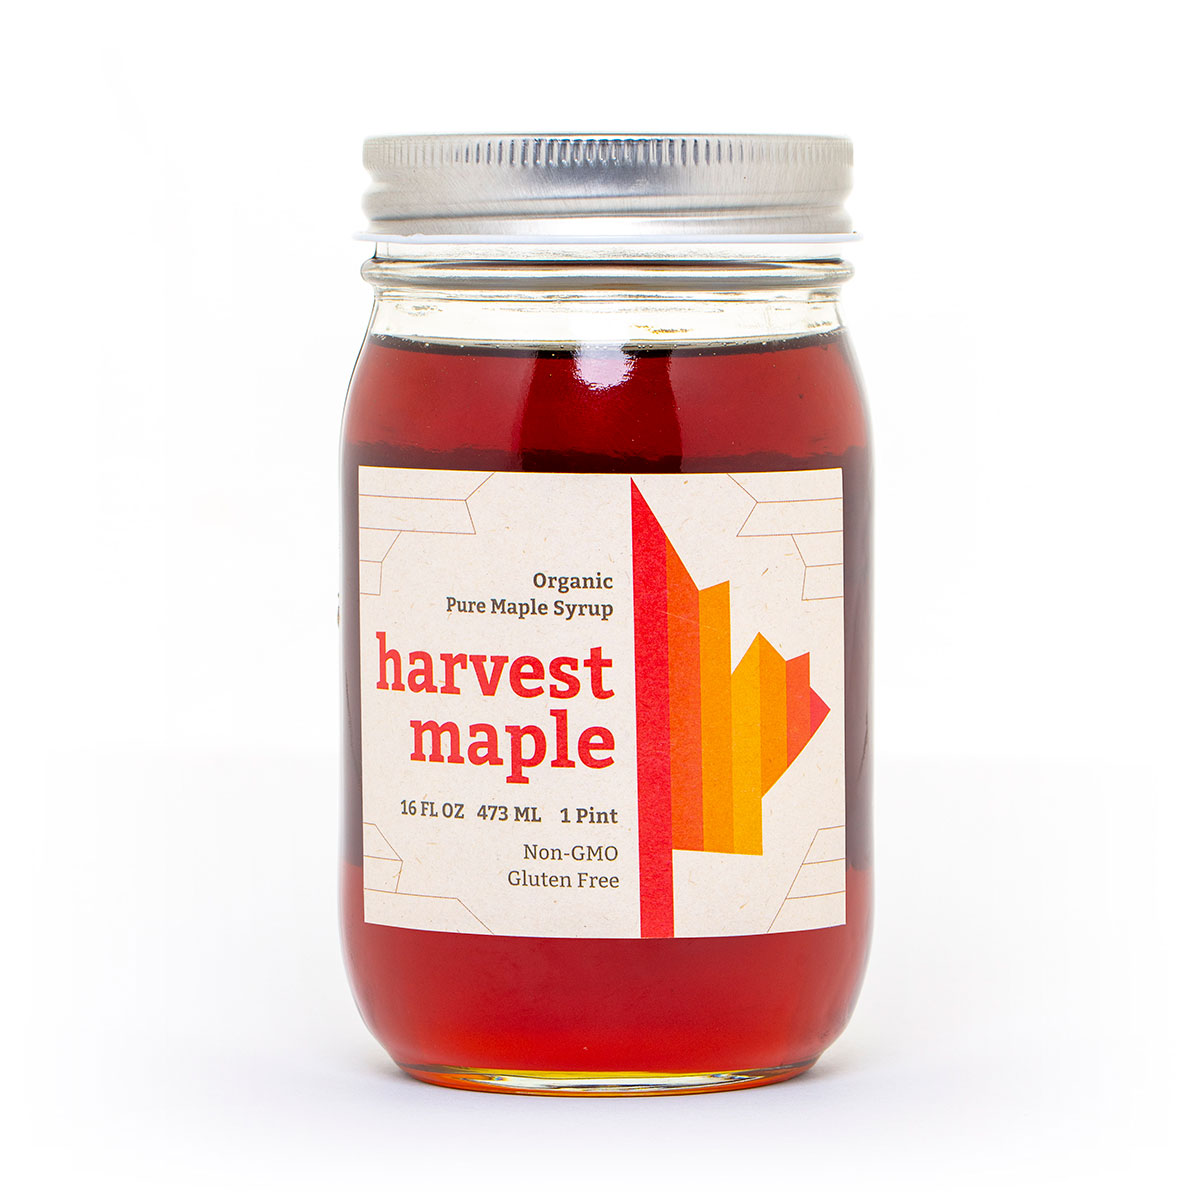 Harvest Maple Organic Maple Syrup - Pint